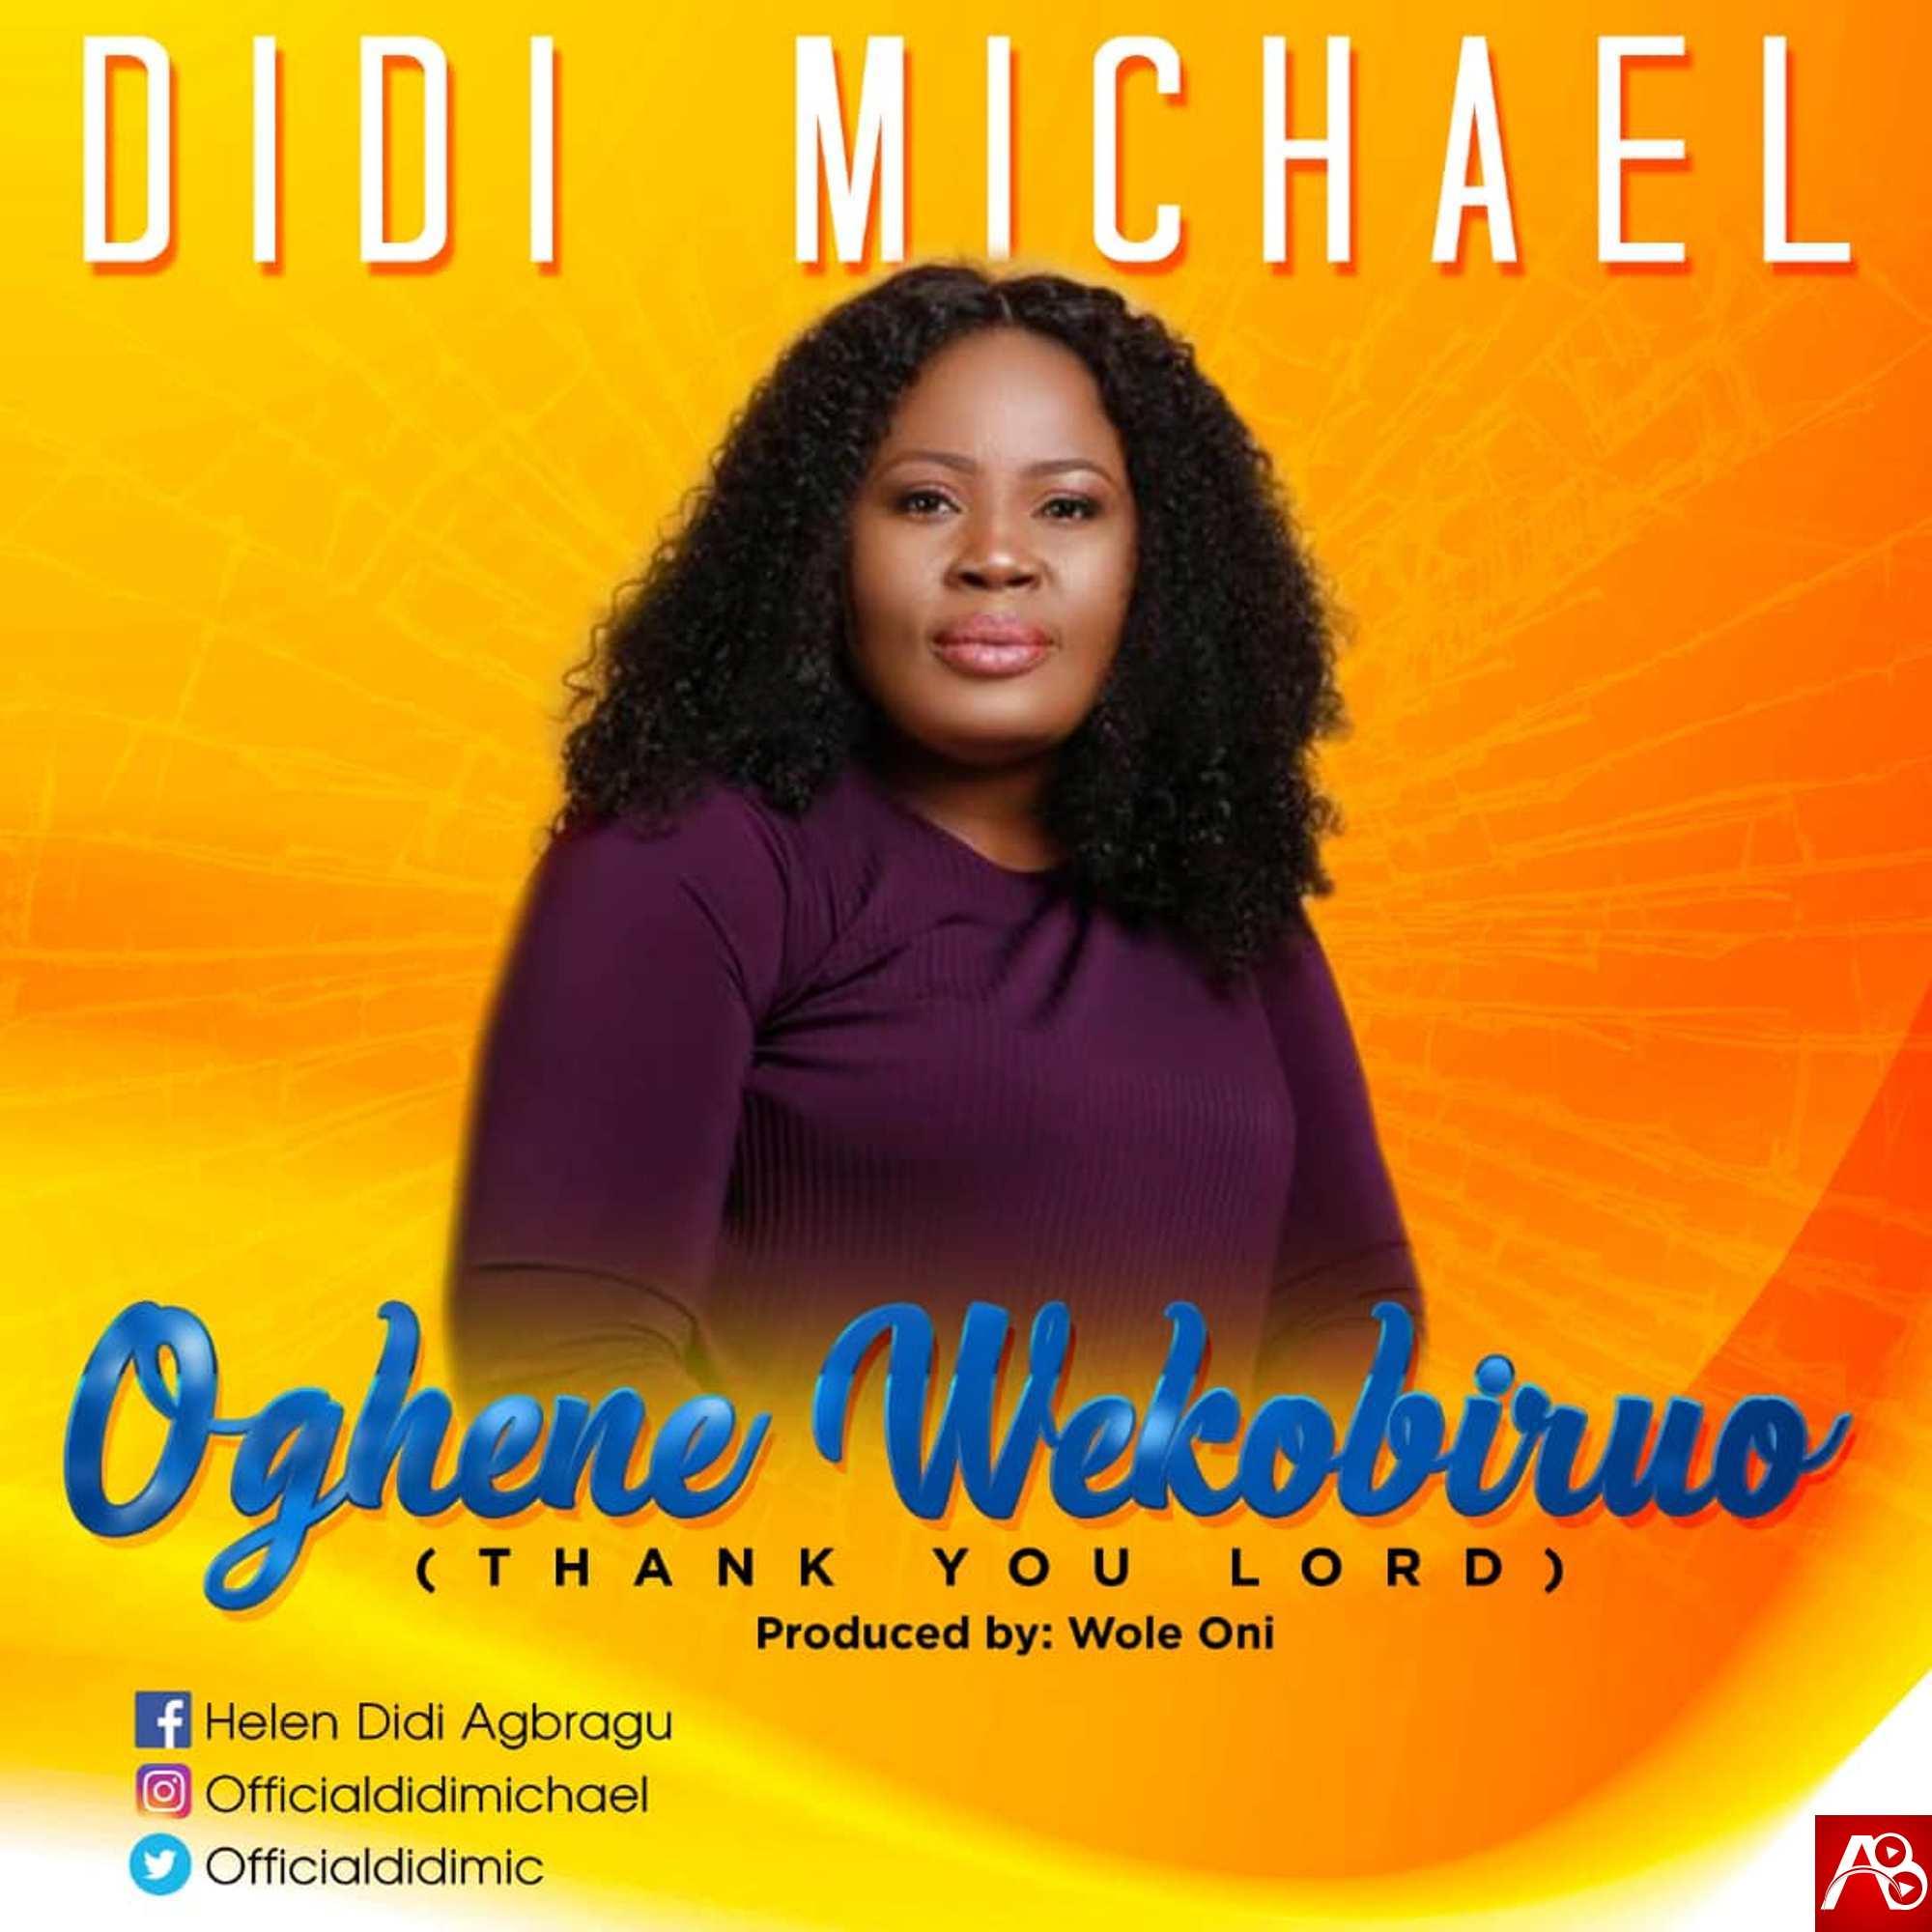 Didi Michael Oghene Wekobiruo